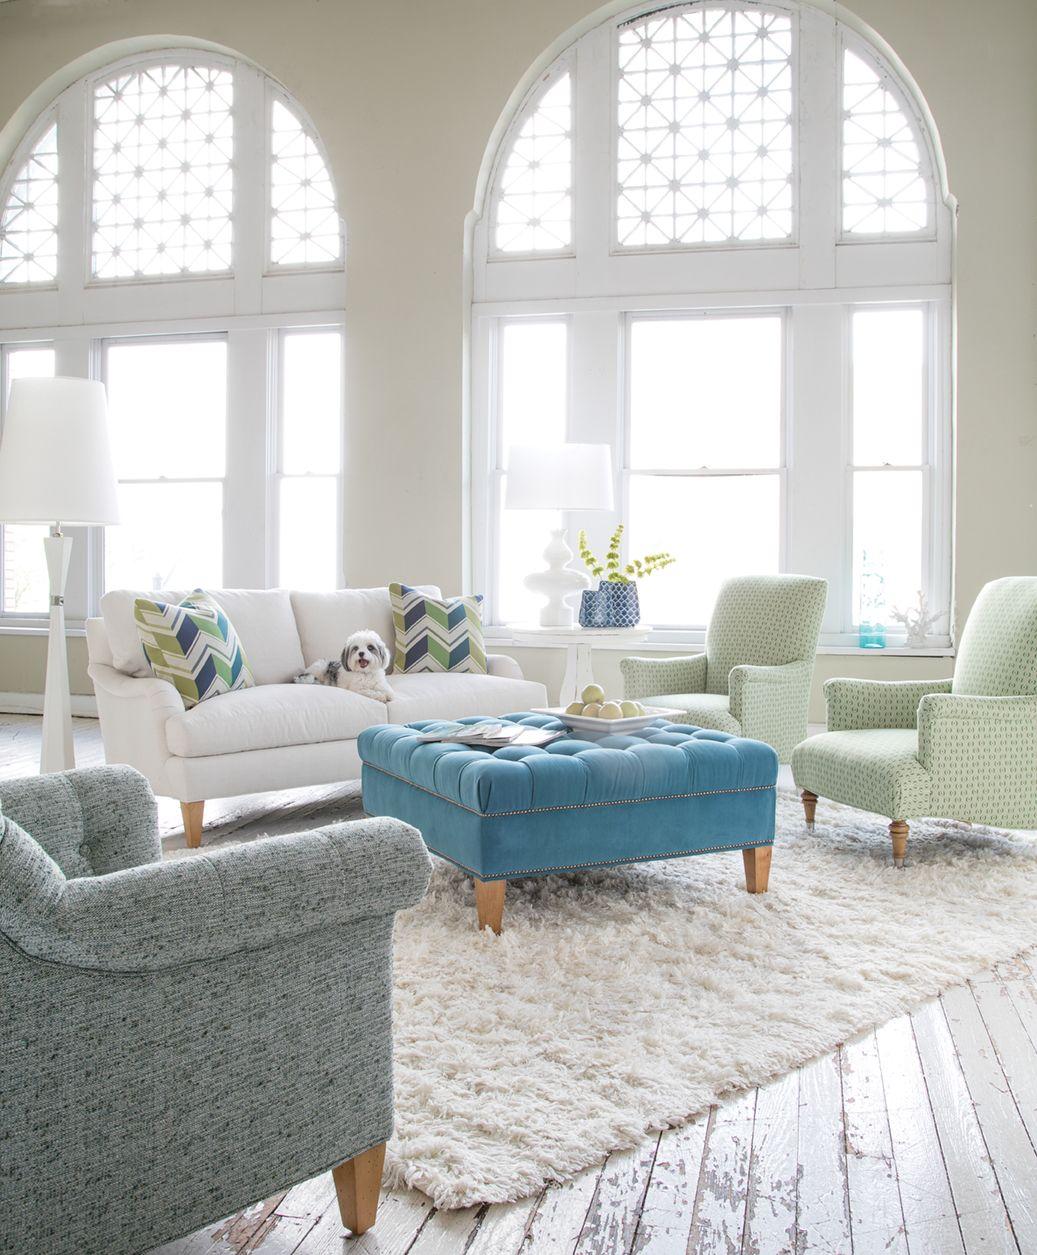 Crypton home fabrics because pets love comfy furniture too sofa chair ottoman performance fabric